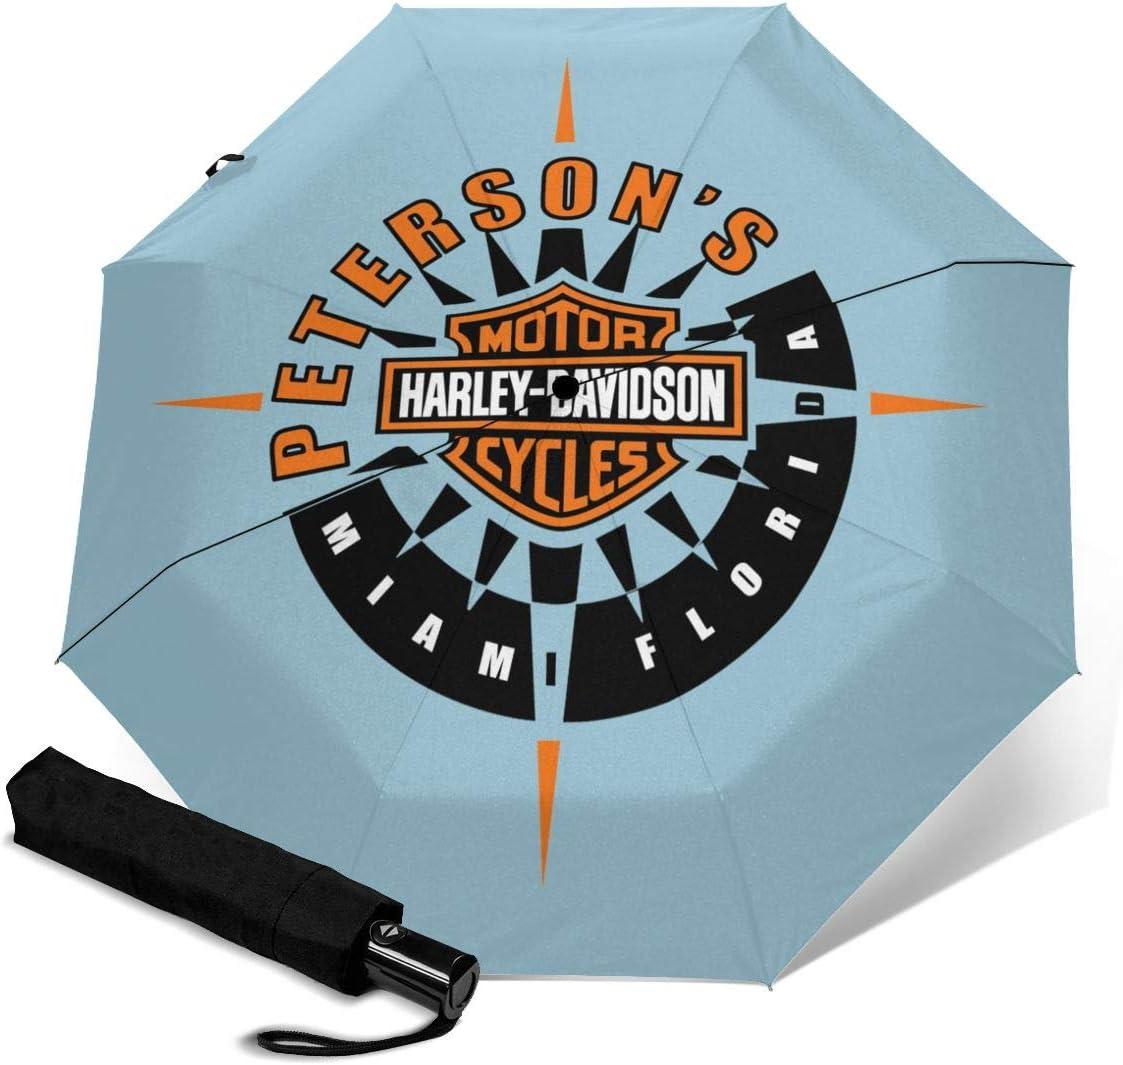 Lovesofun Portable Automatic Umbrella Harley David-Son Compact Auto Open Close Folding Business Umbrellas UV Protection Automatic Tri-fold Umbrella for Men and Women